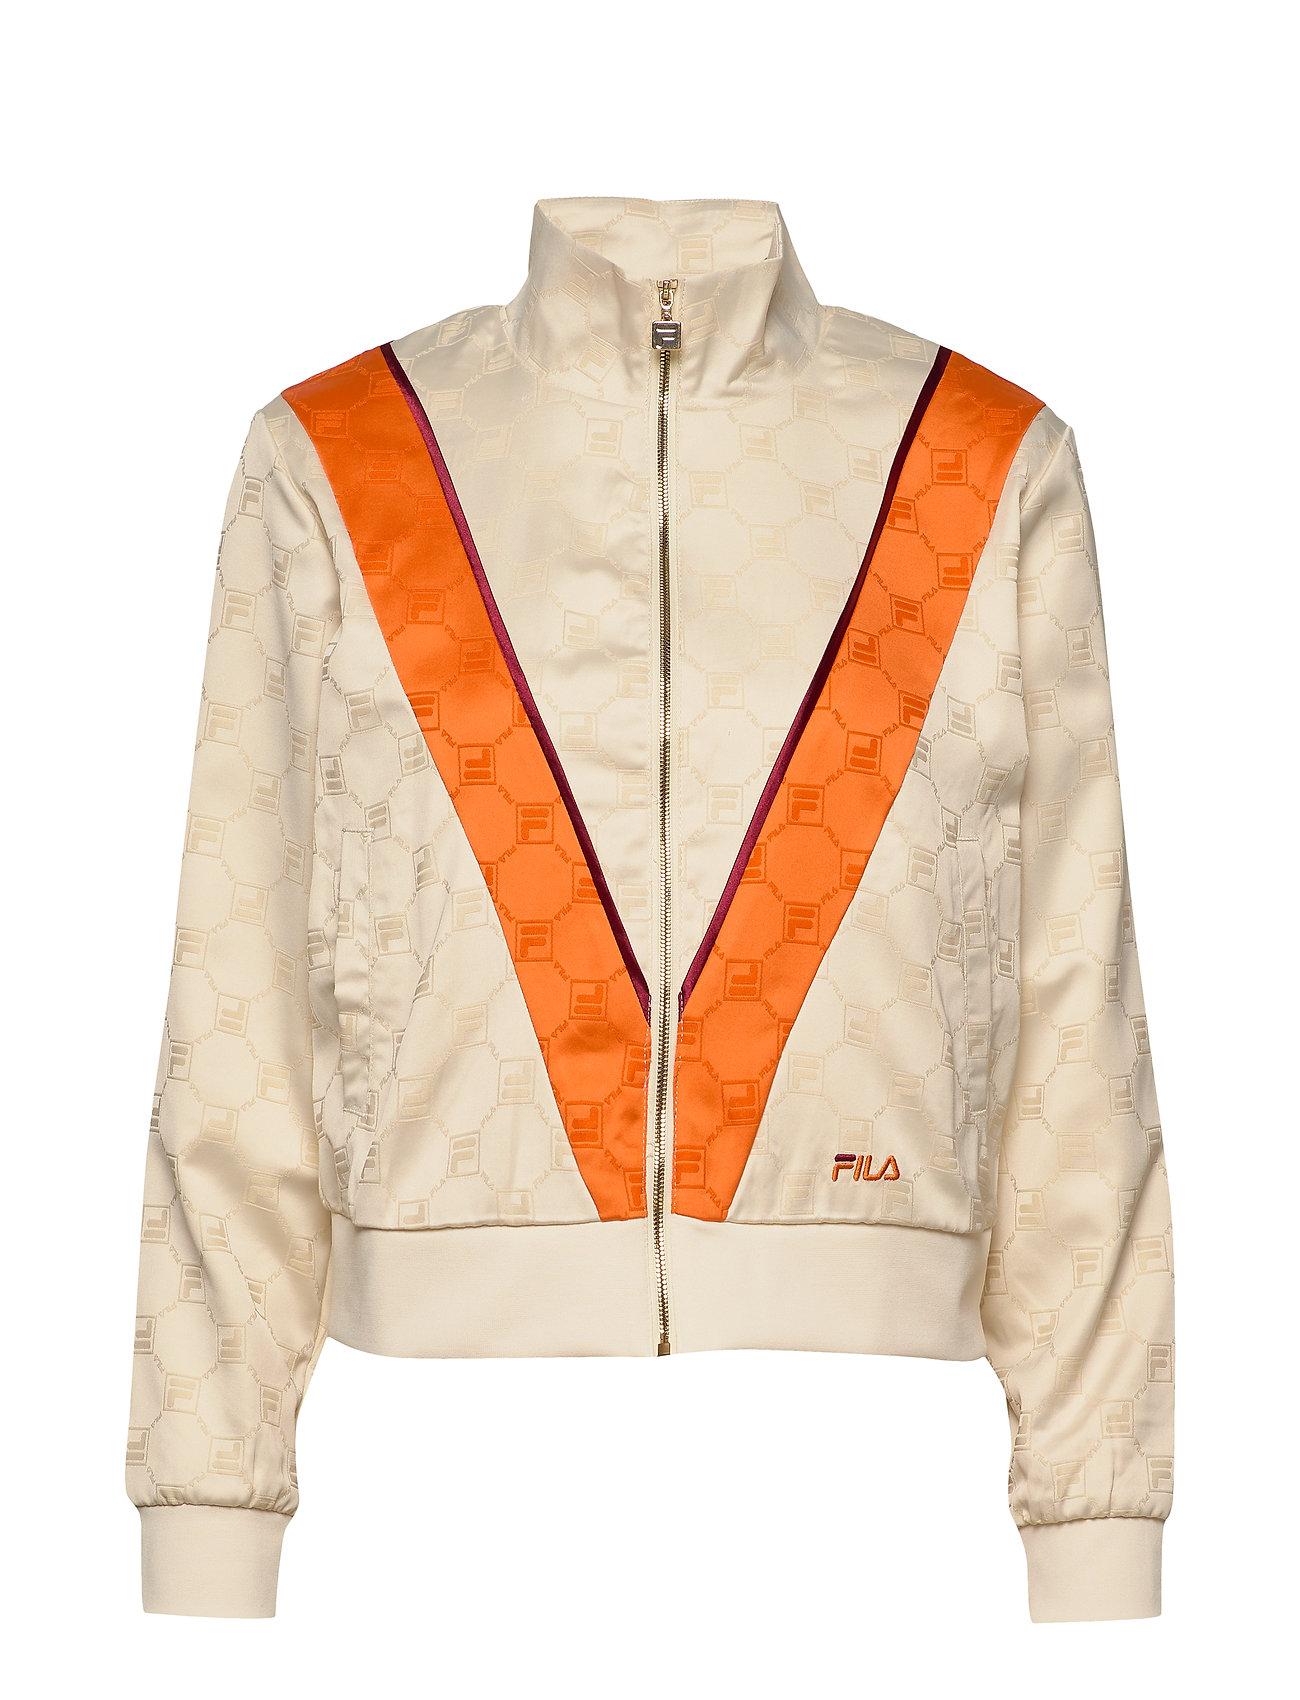 Image of Women Halle Satin Track Jacket Sweatshirt Trøje Orange FILA (3362841465)